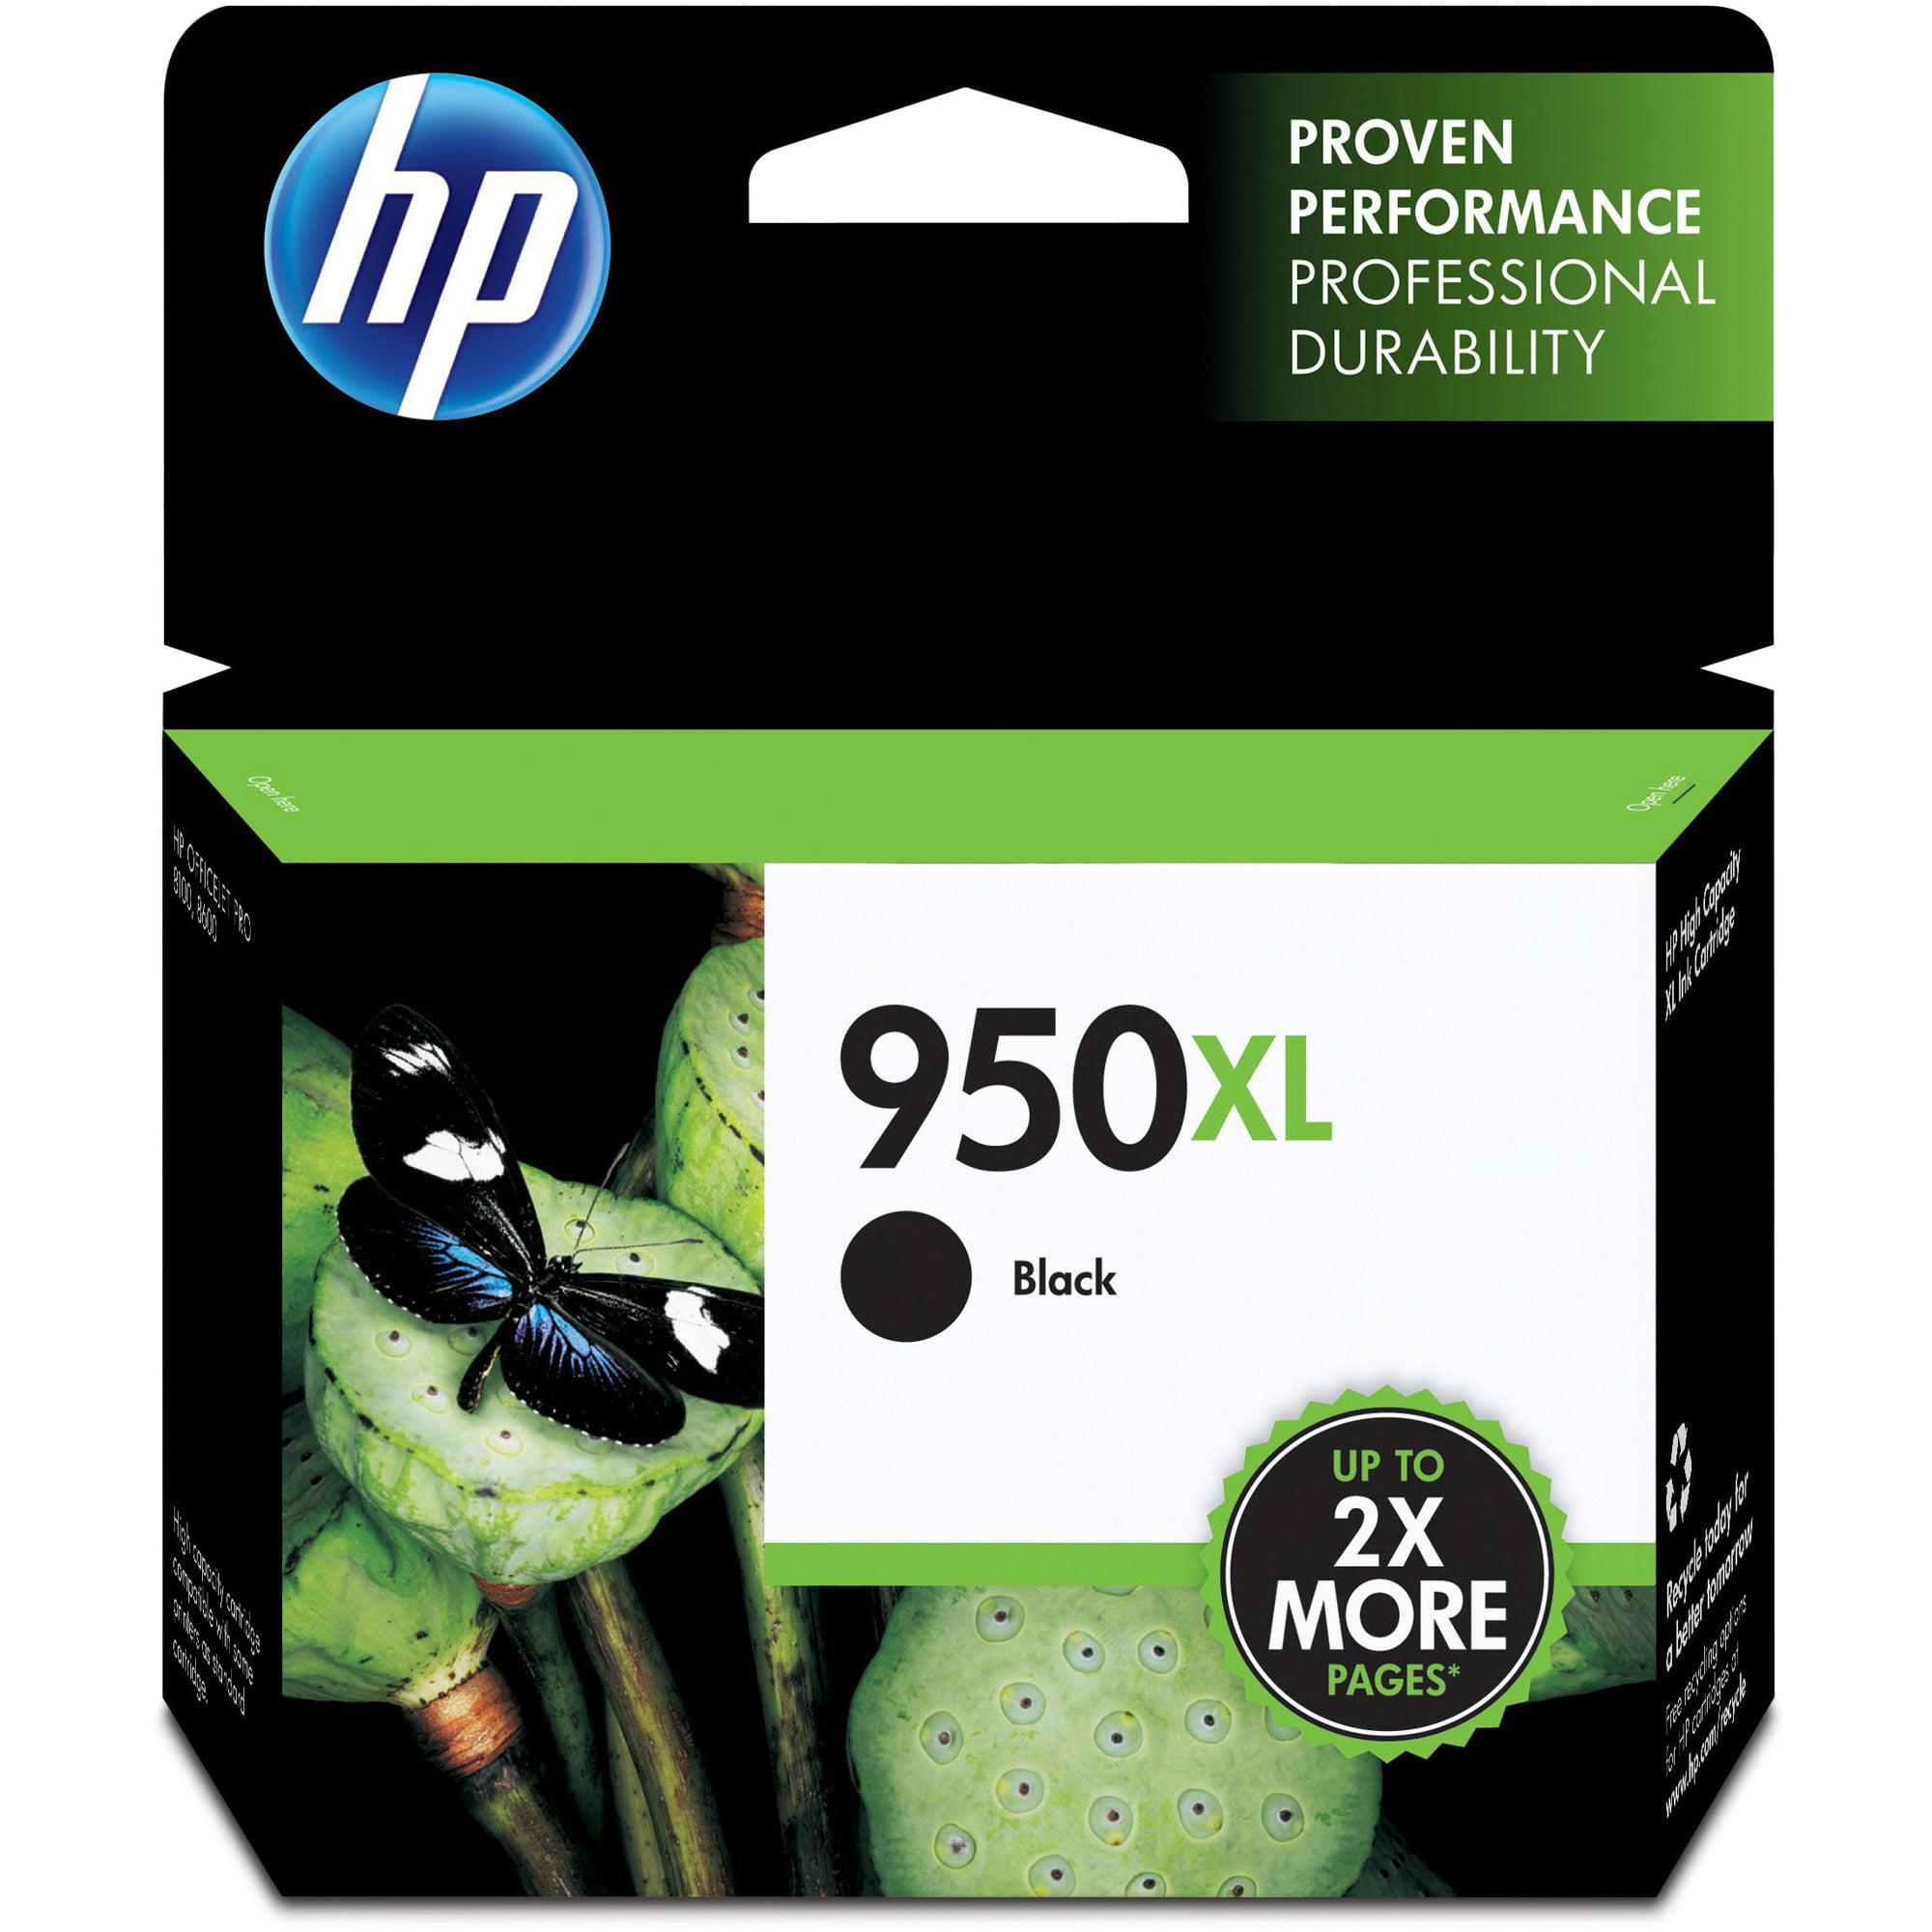 HP 950XL Original Ink Cartridge, 1 Each (Quantity)